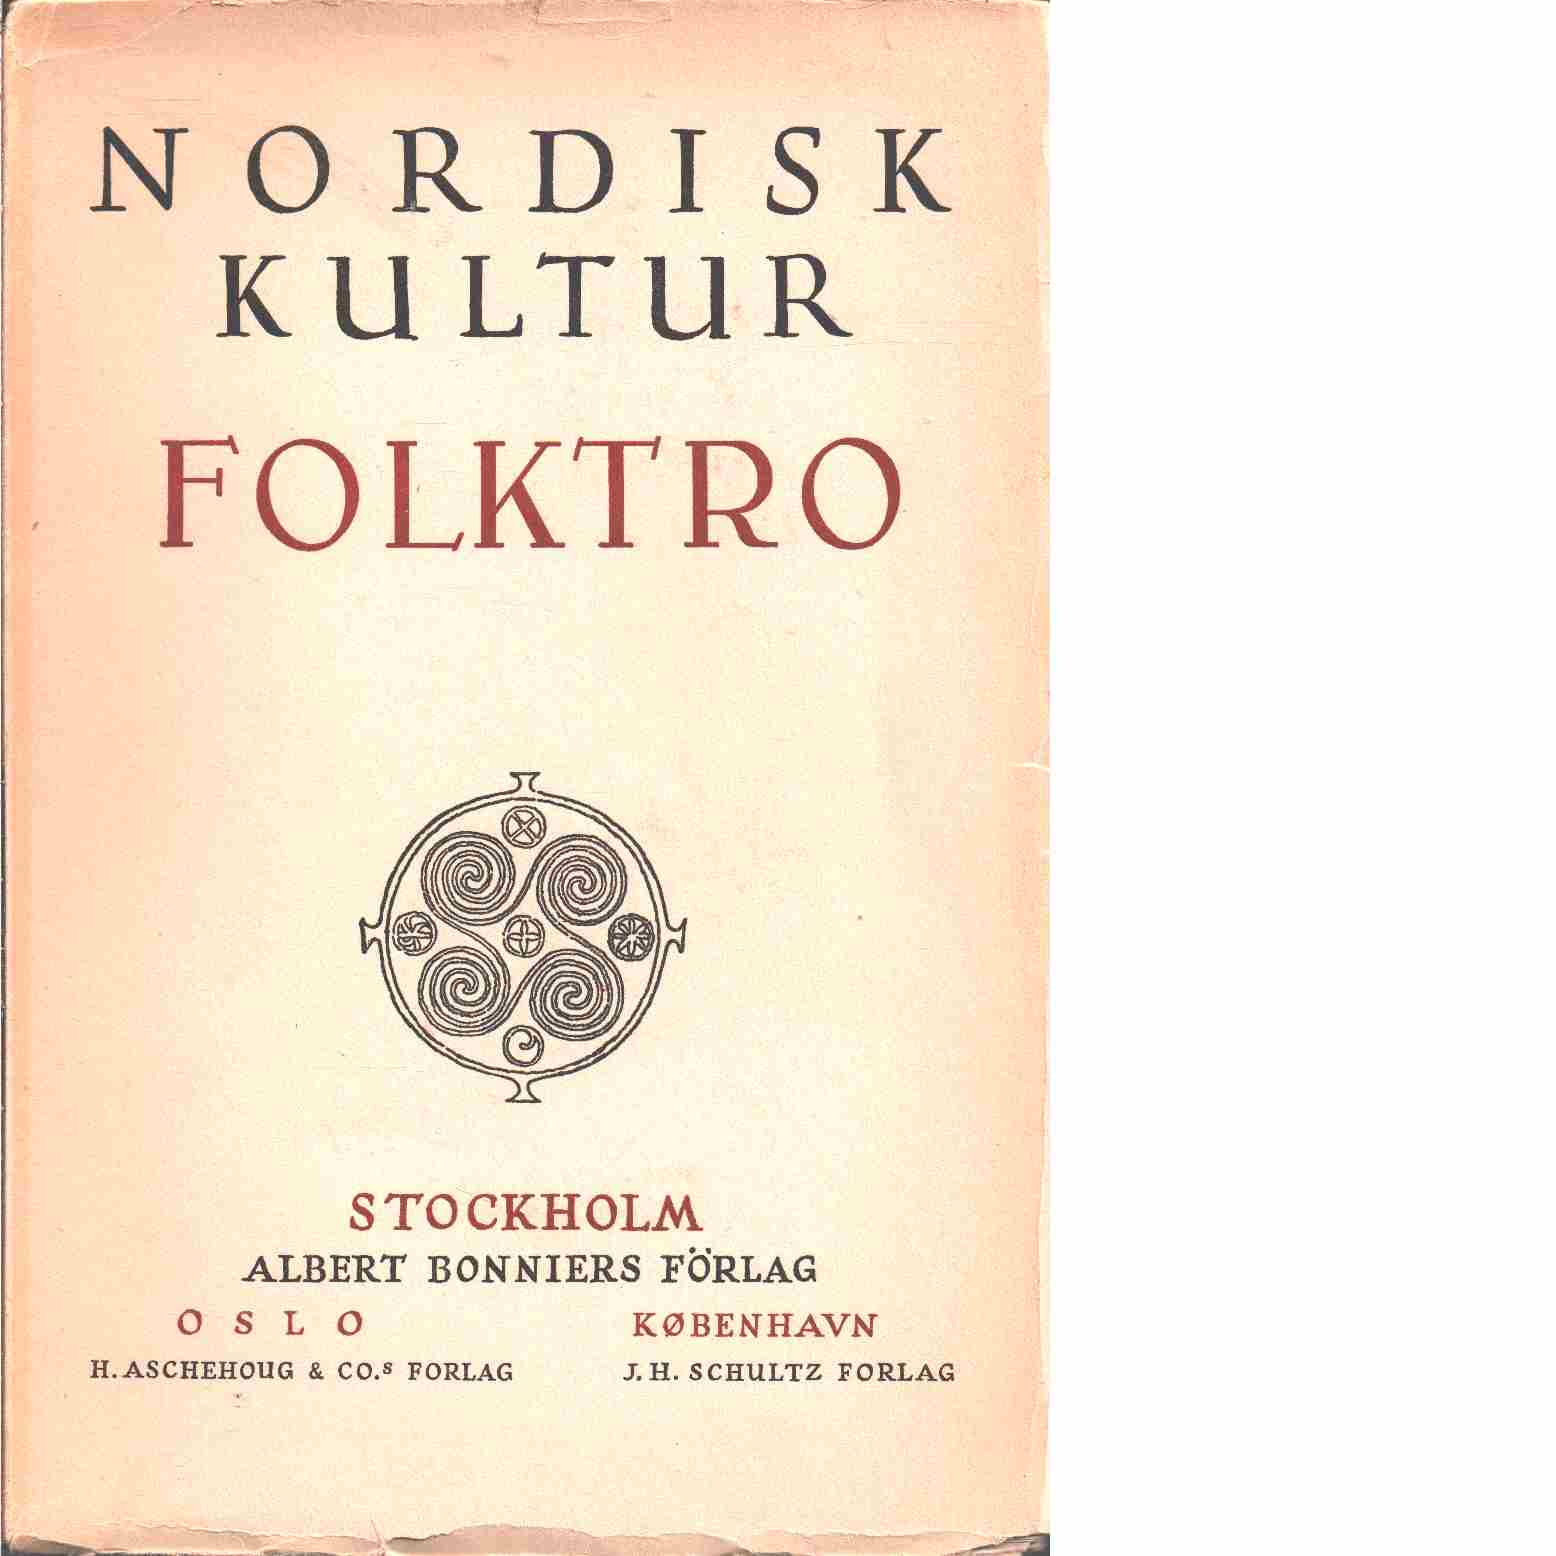 Nordisk kultur : samlingsverk. 19, Folketru - Red. Brøndum-Nielsen, Johannes och Lid, Nils